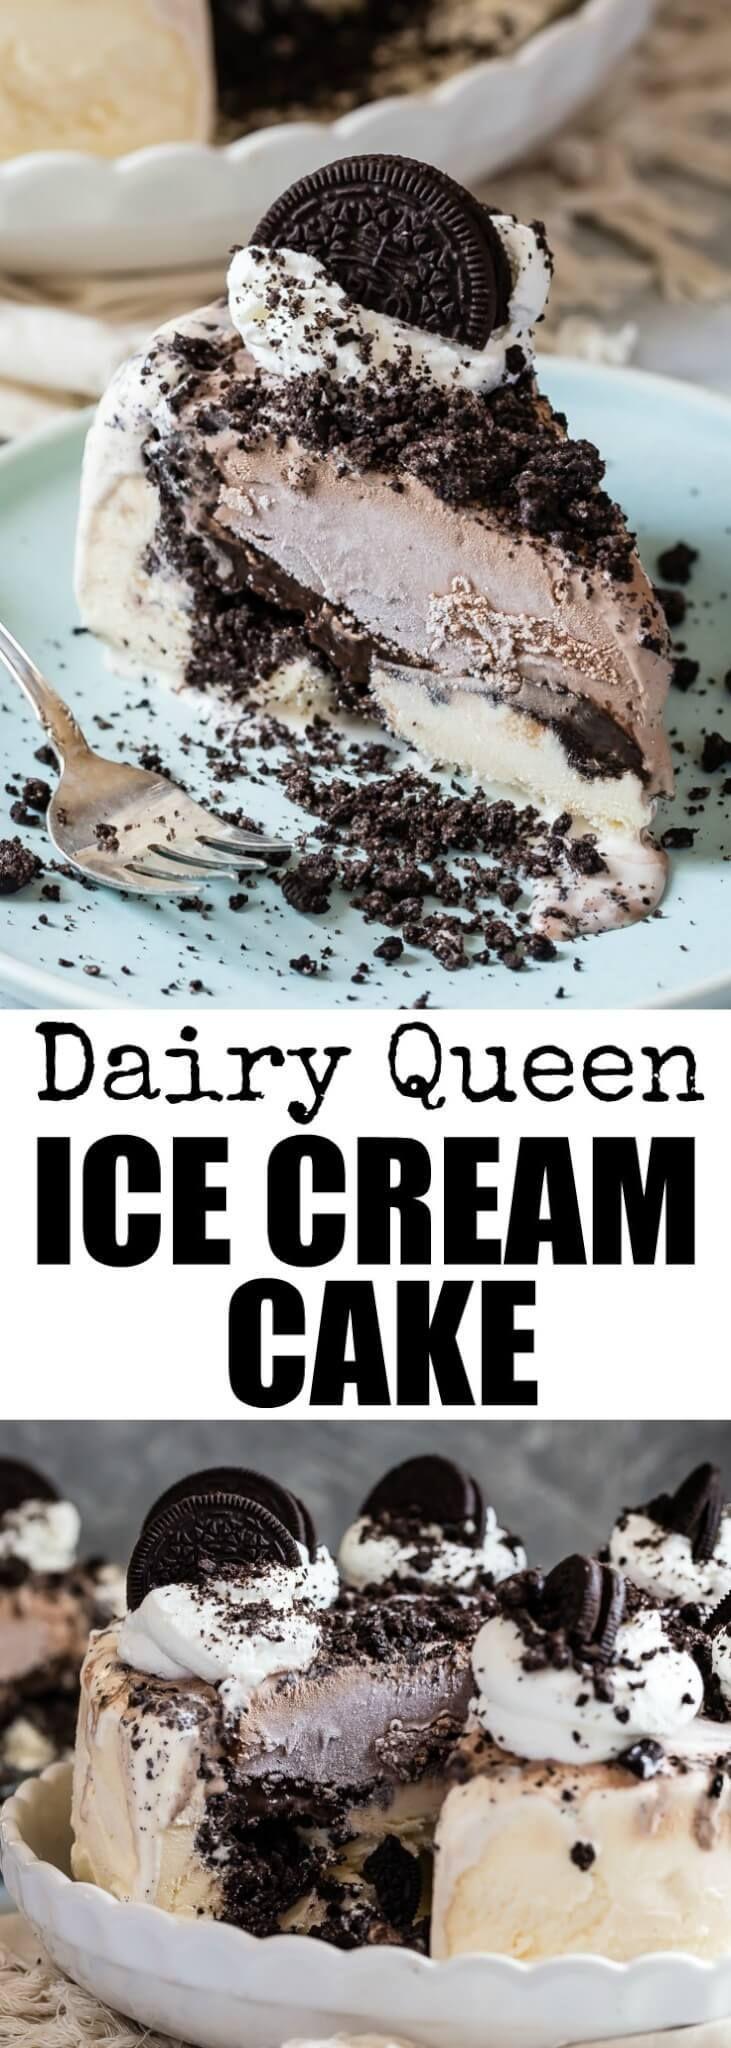 Easy ice cream cake dq copycat culinary hill recipe